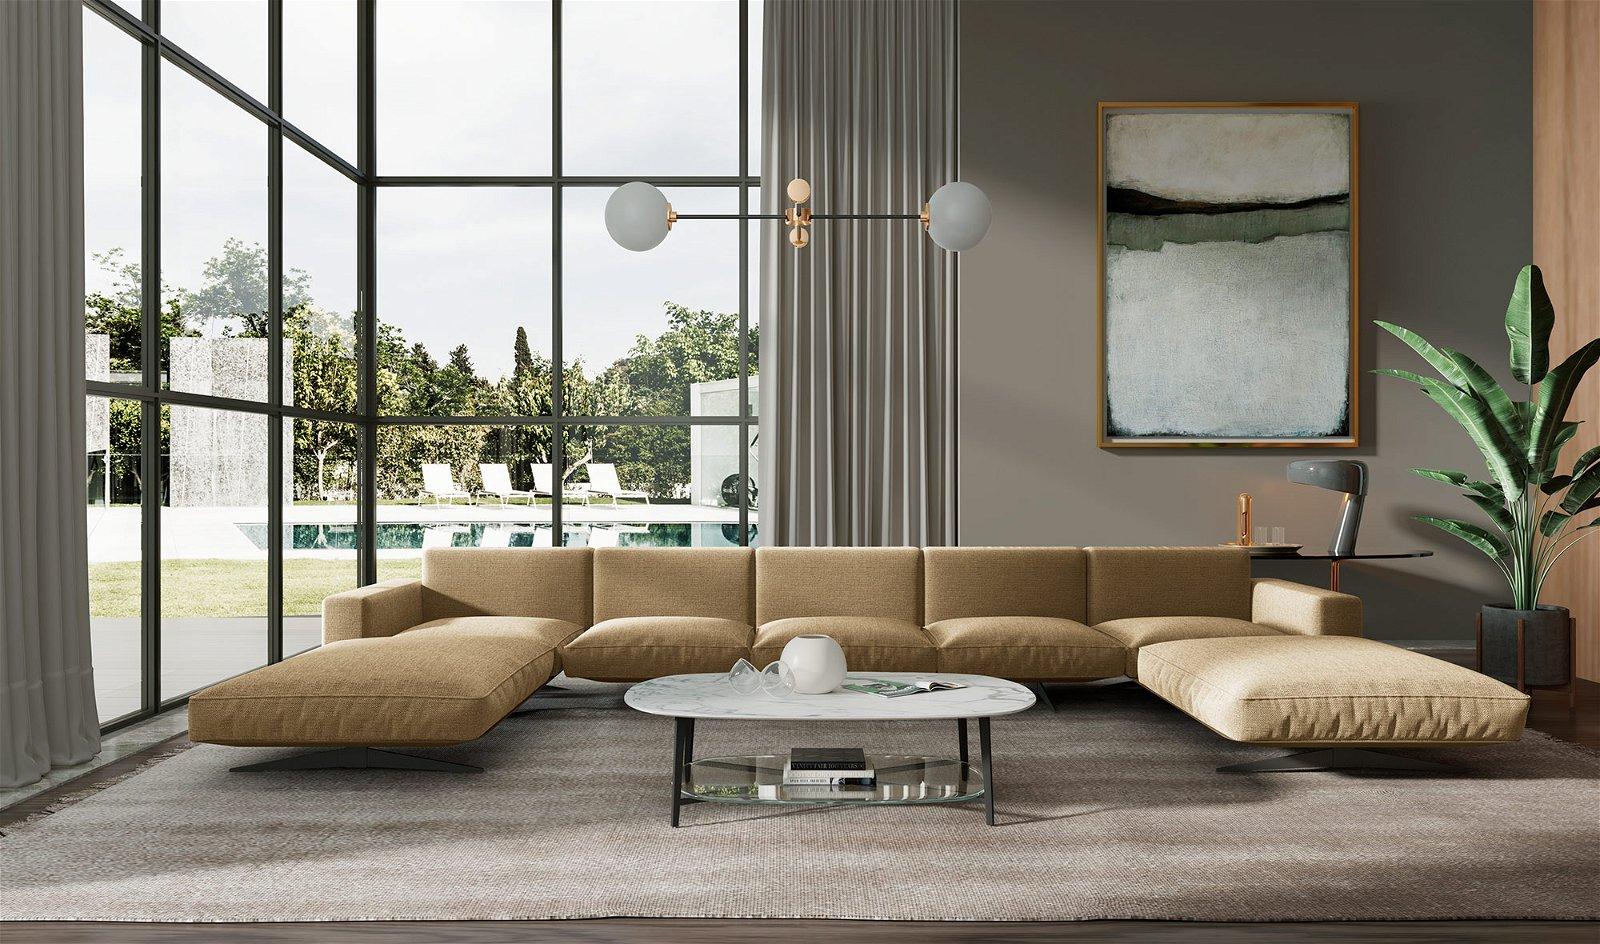 Sofá doble chaise longue moderno Florencia